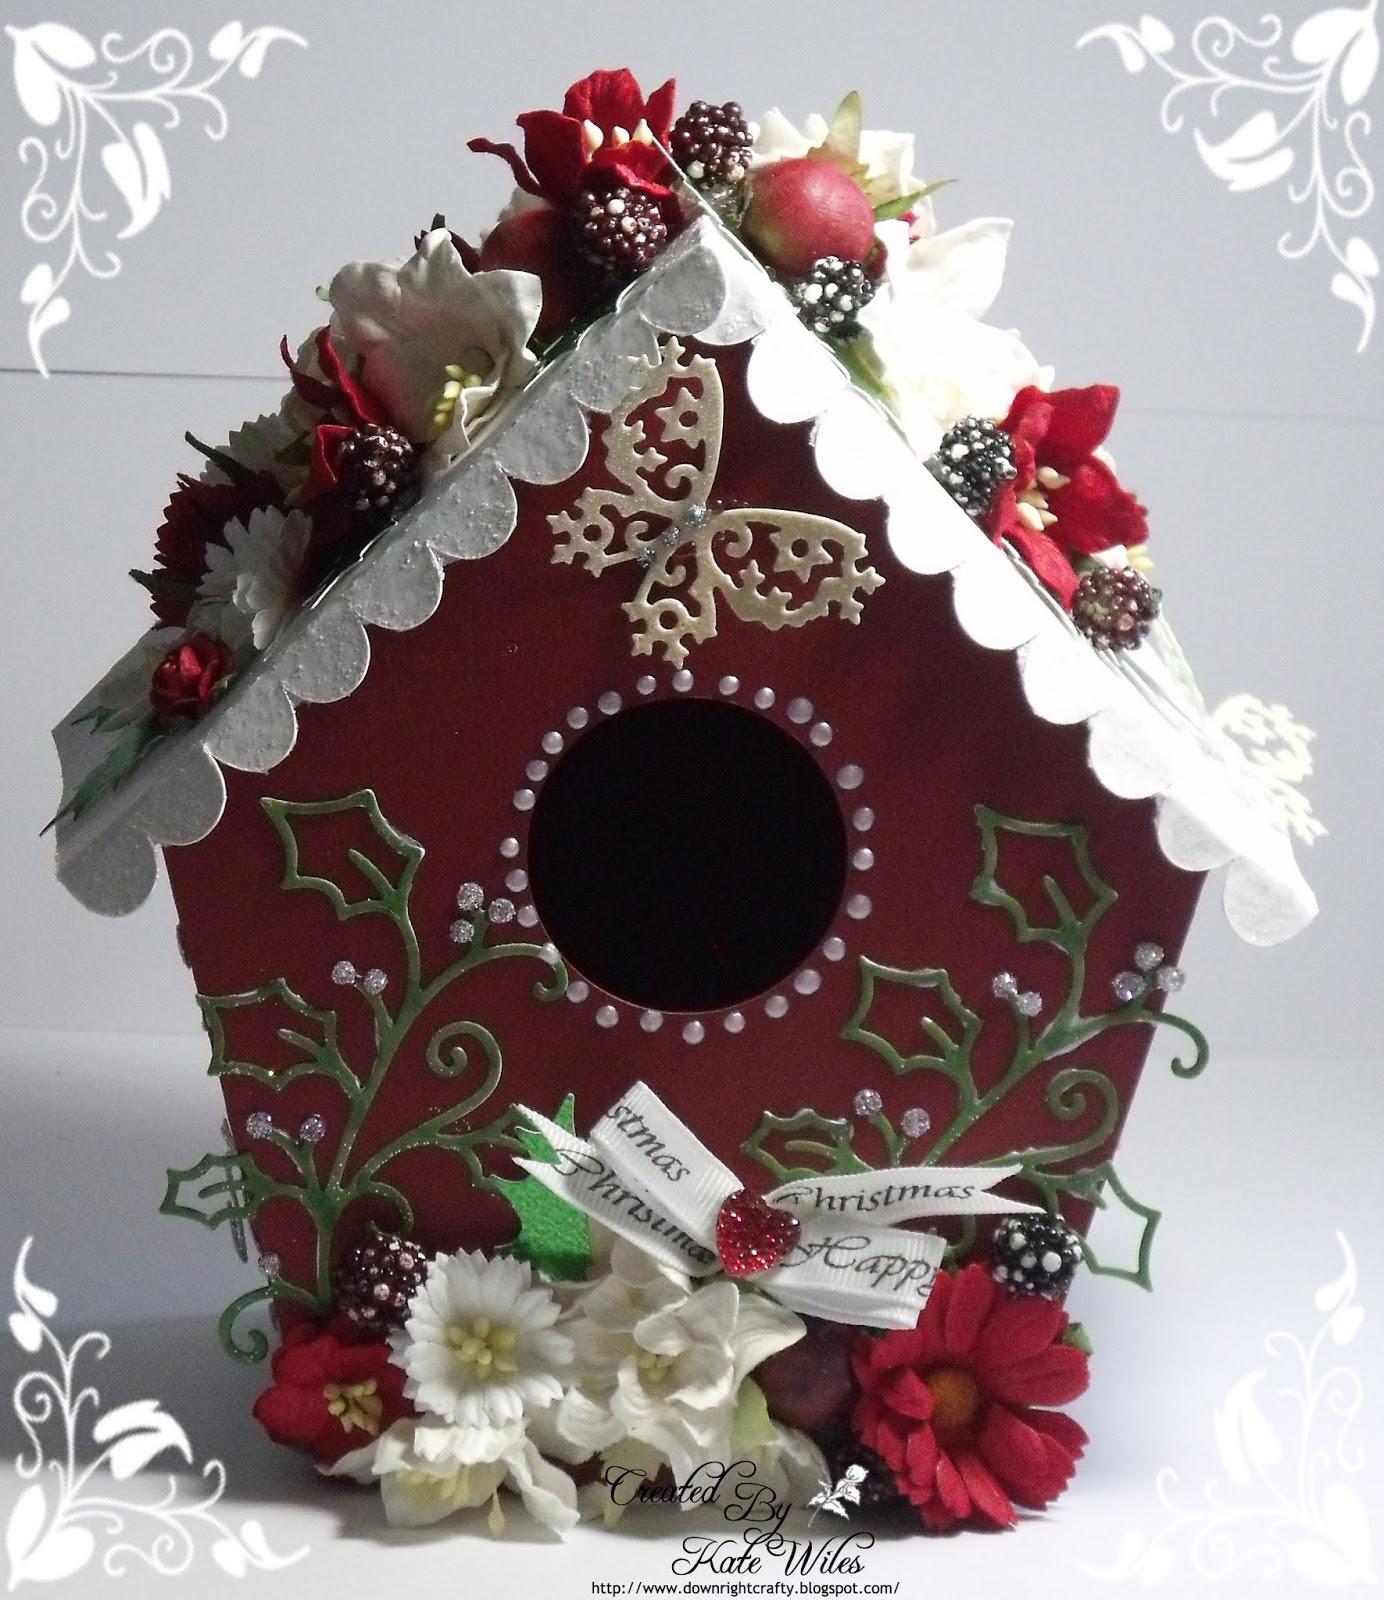 Wild Rose Studio: Christmas Birdhouse